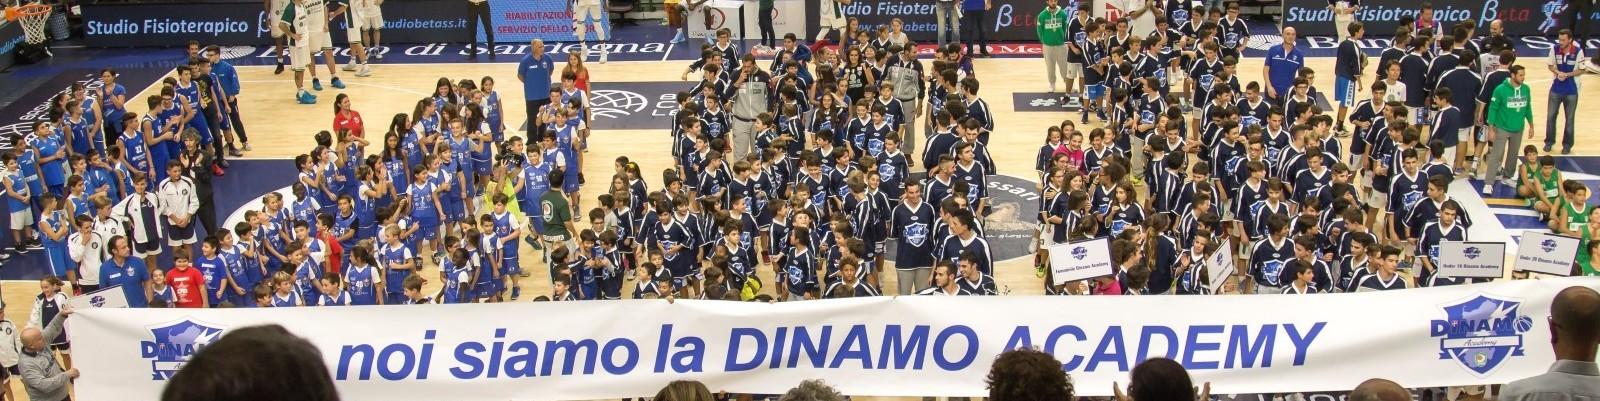 Dinamo Academy